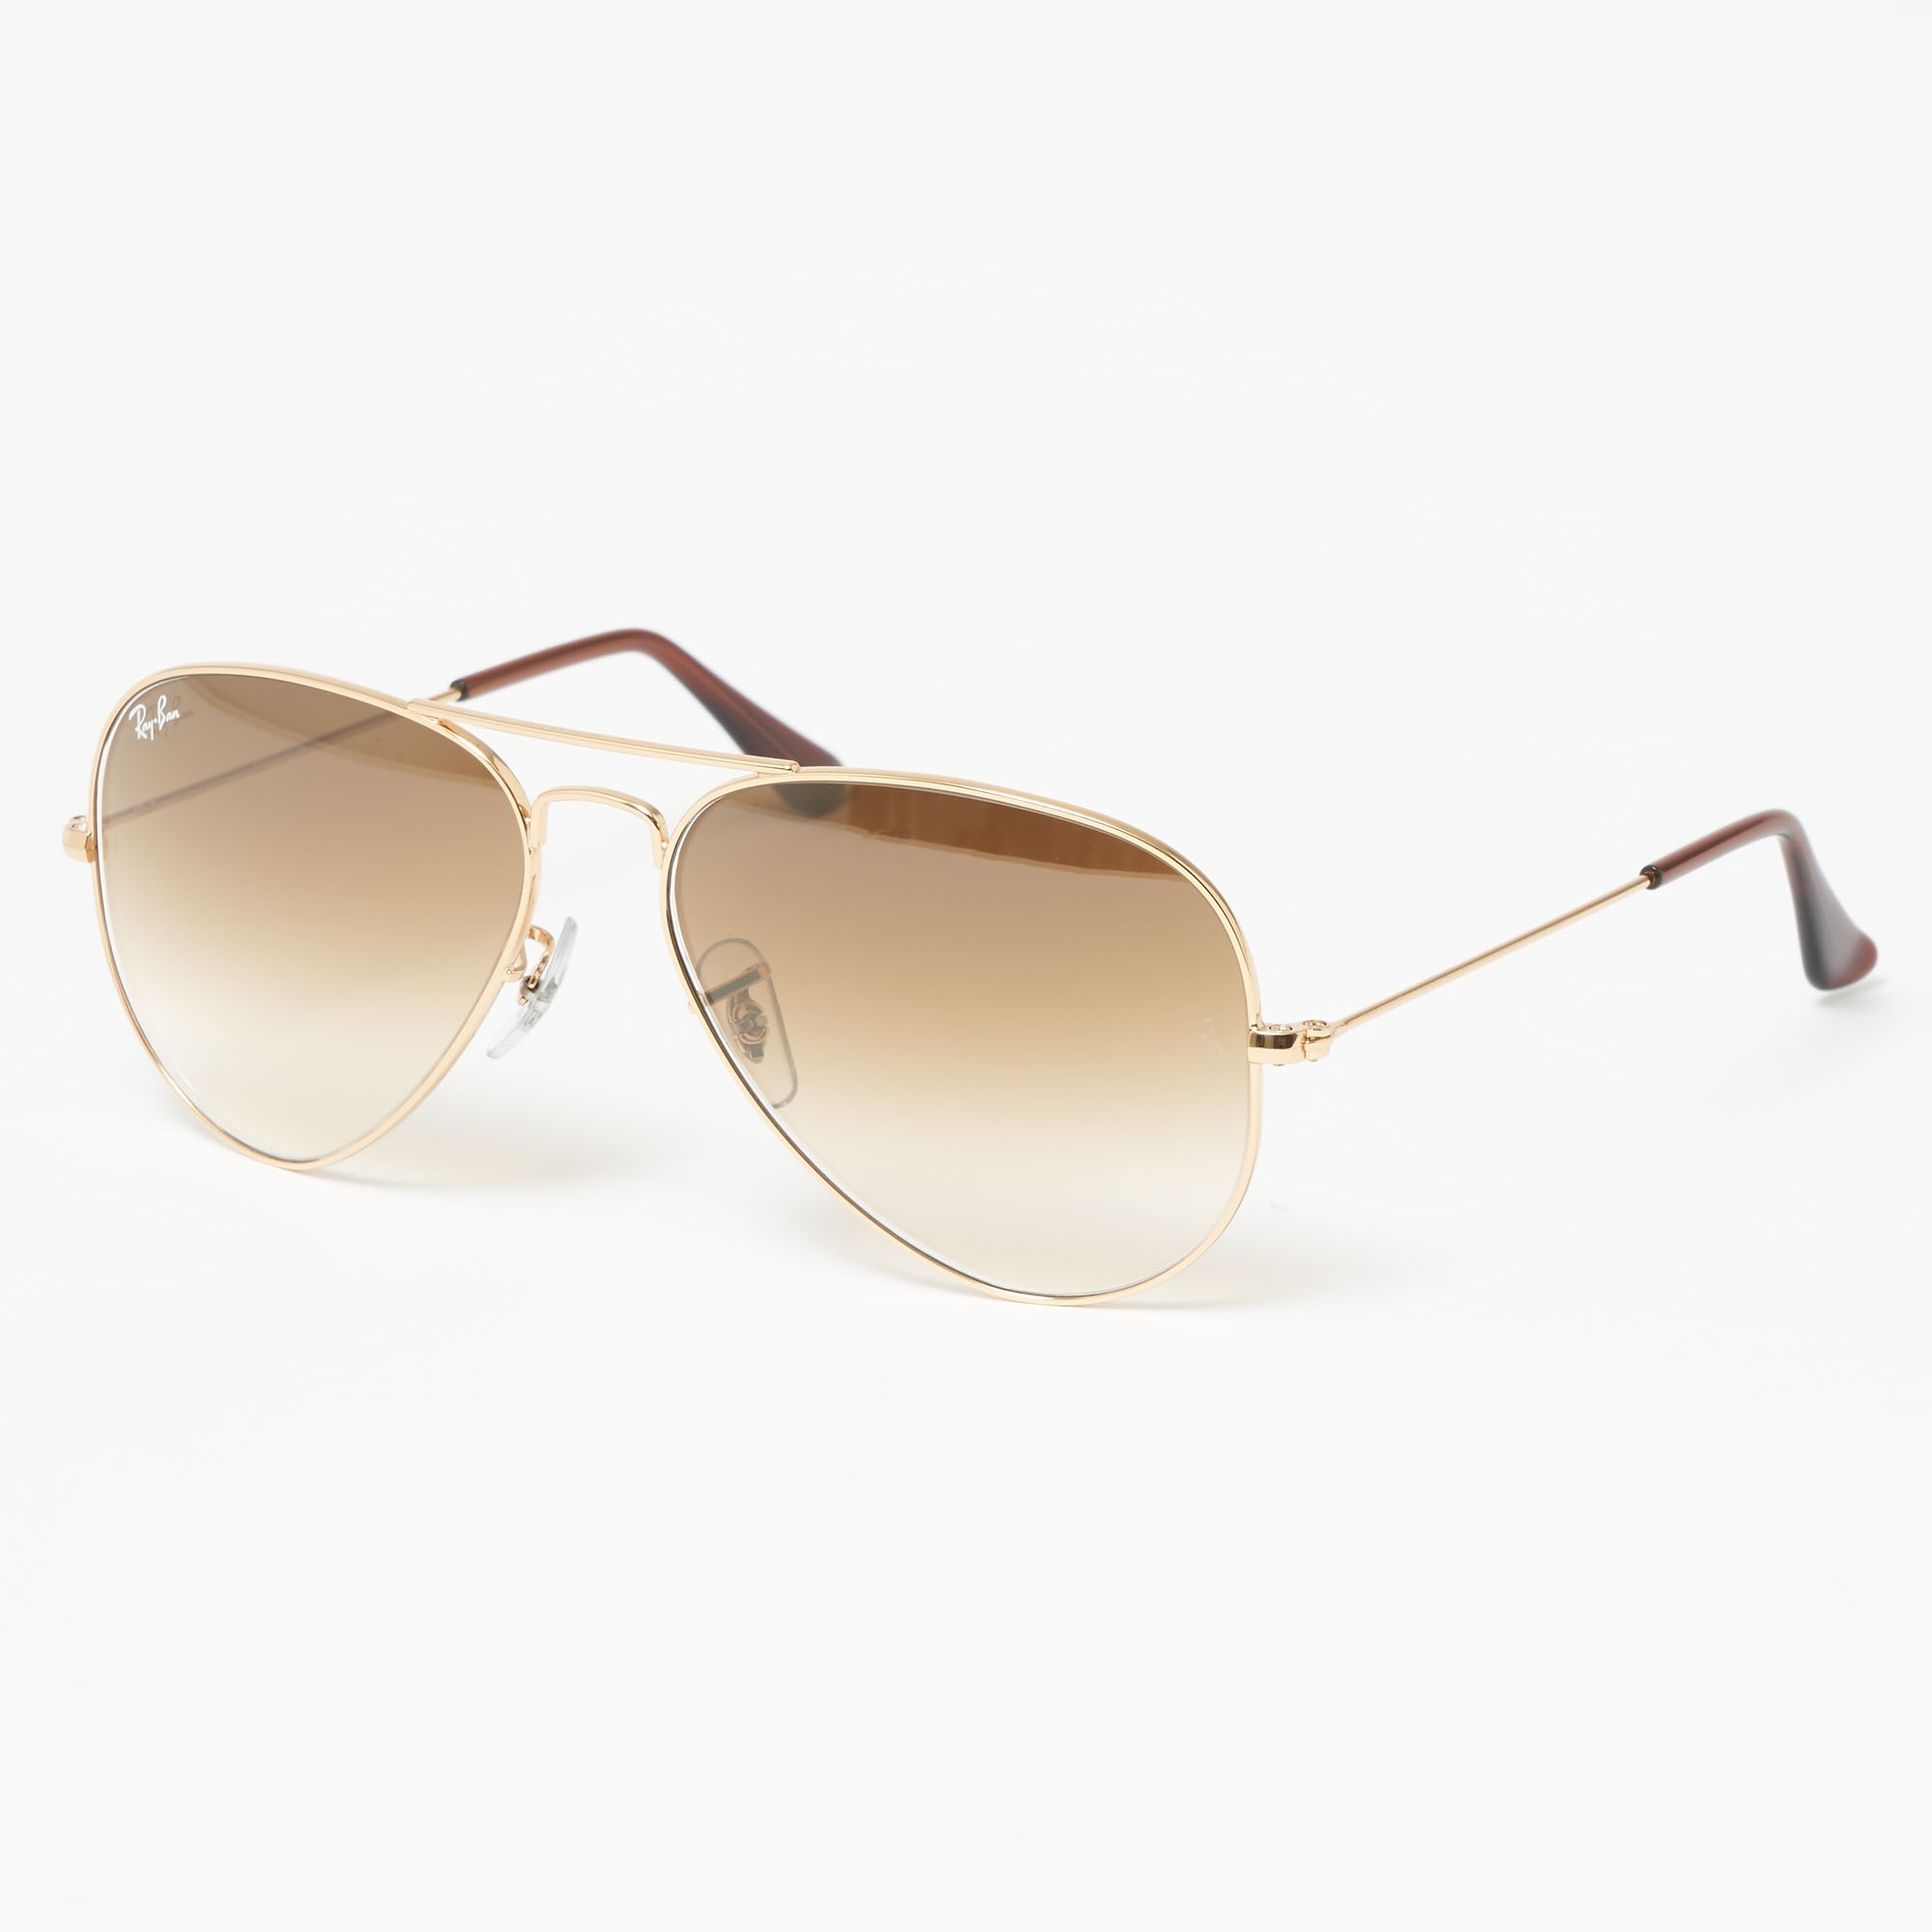 cd482766ee Gold Aviator Gradient Sunglasses - Light Brown Gradient Lenses